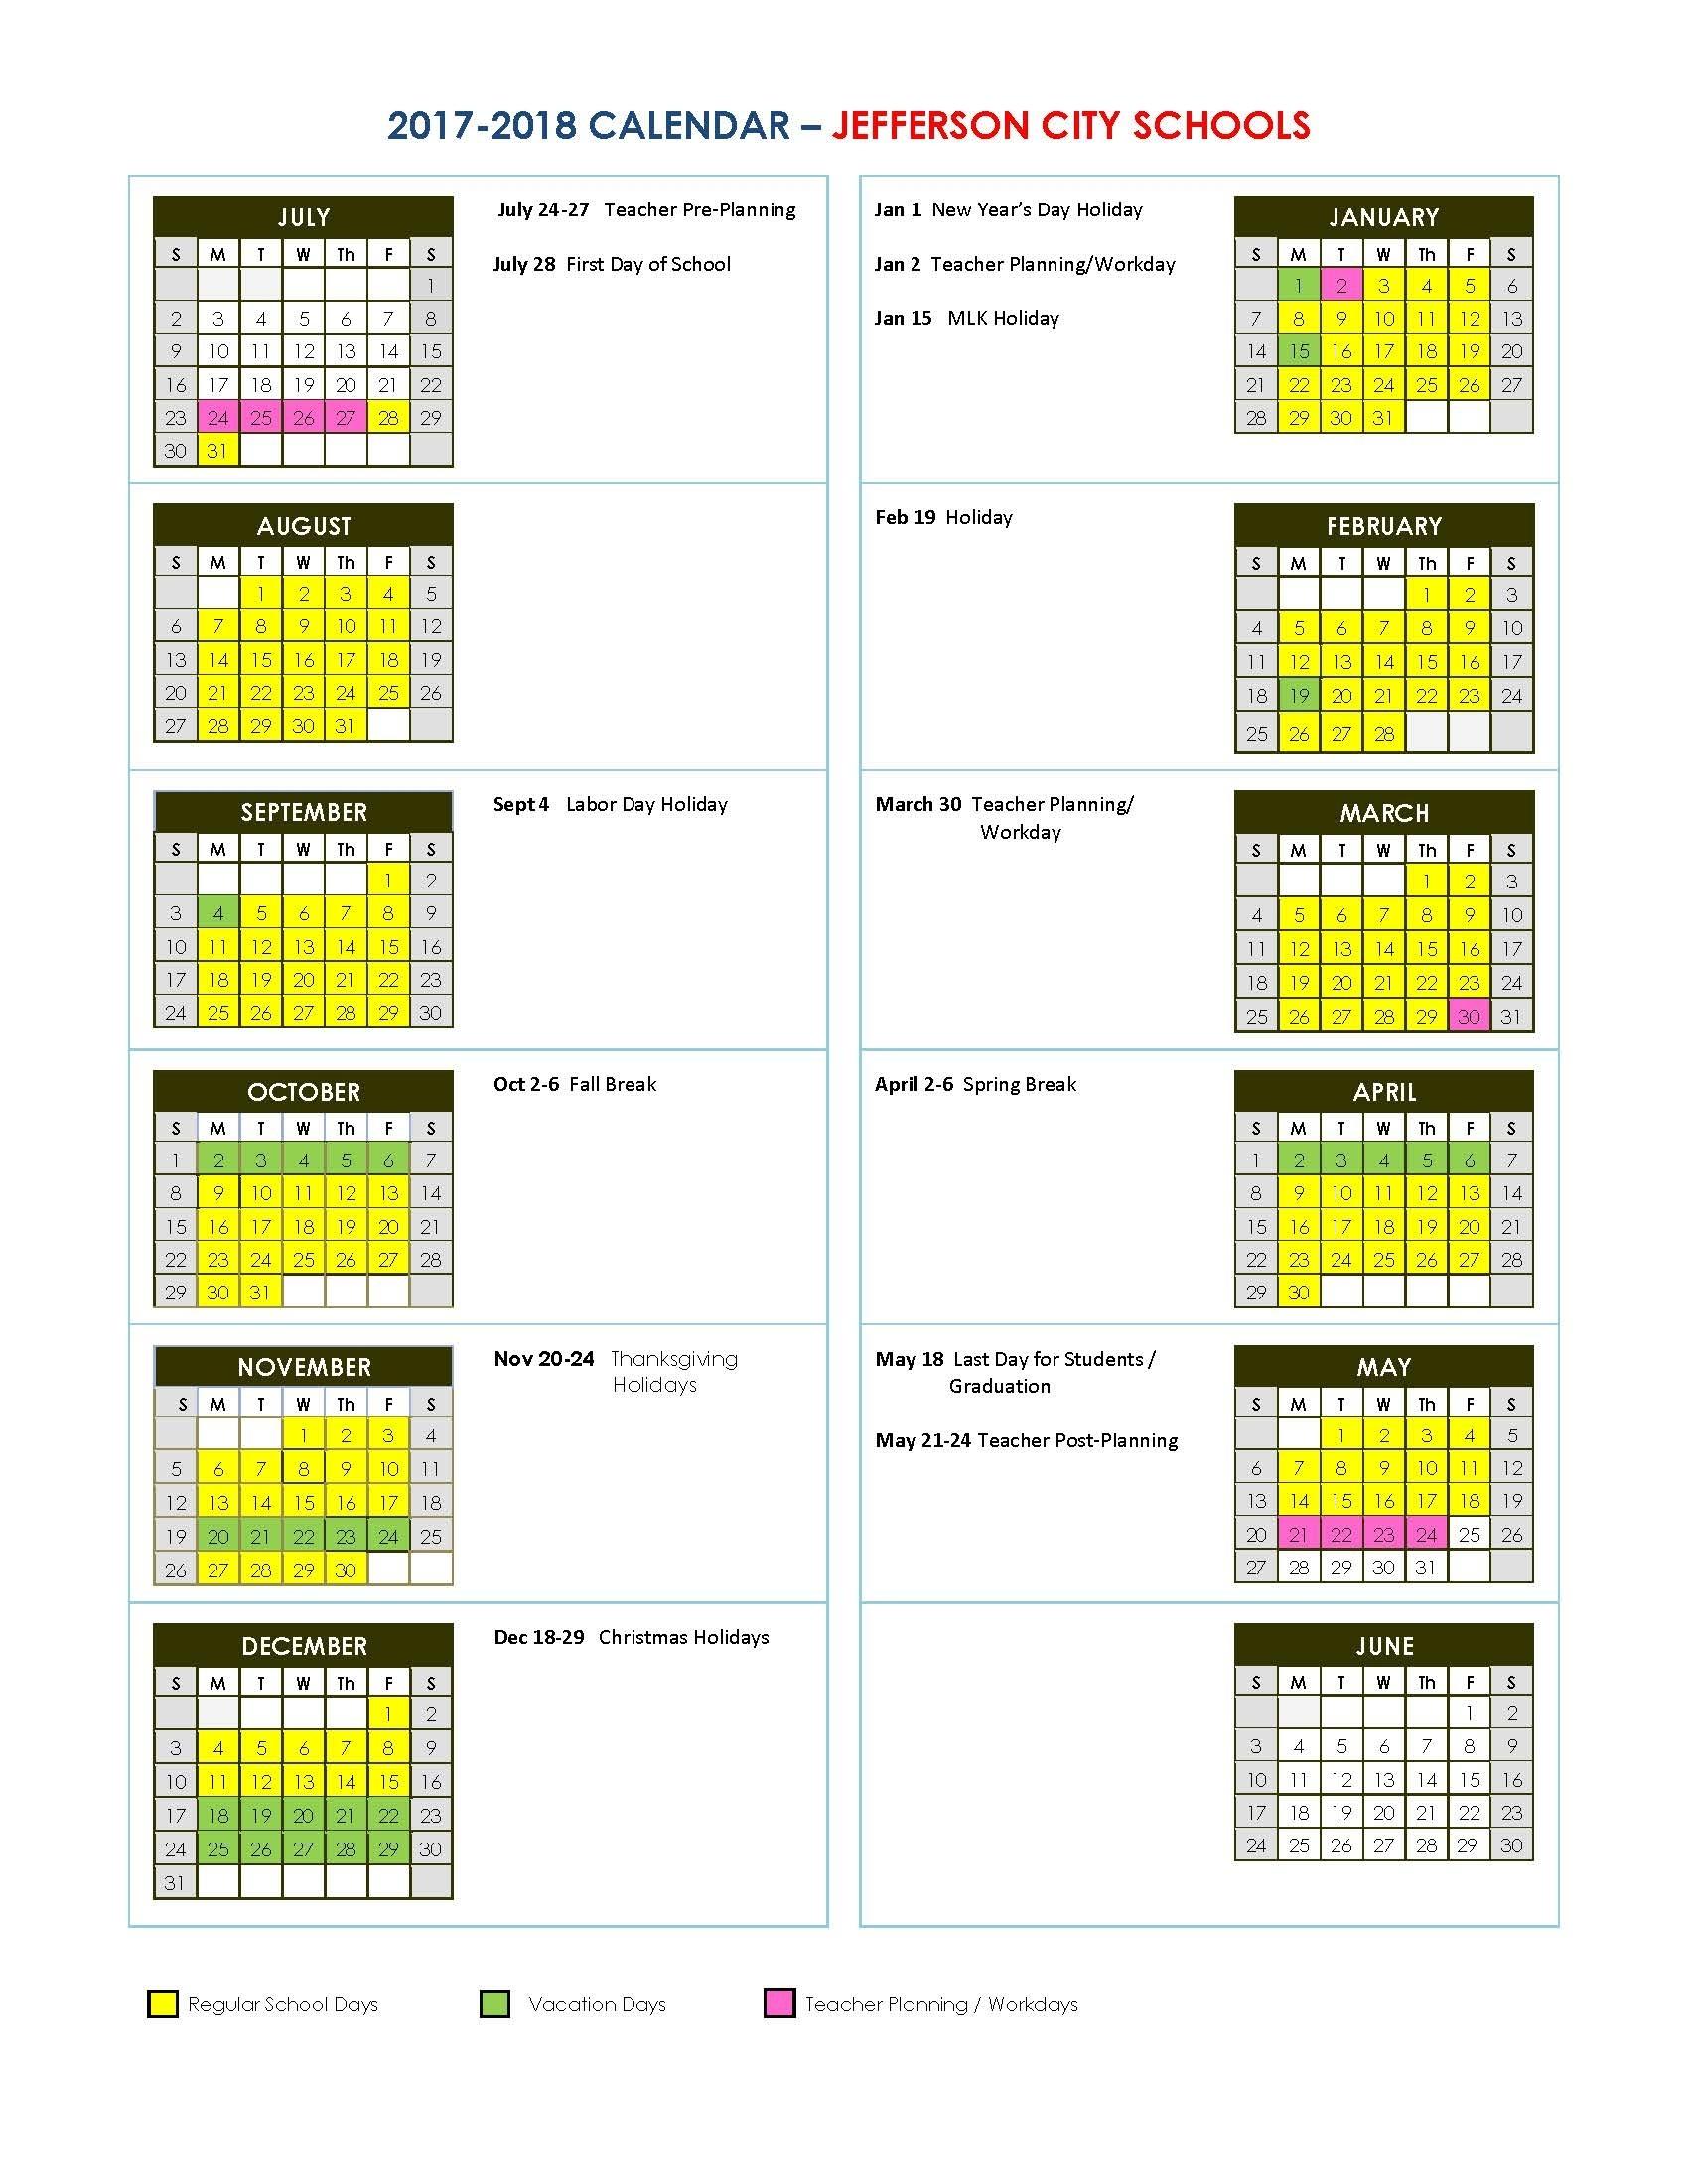 Jefferson City Schools throughout Uga  Calendar 2019-2020